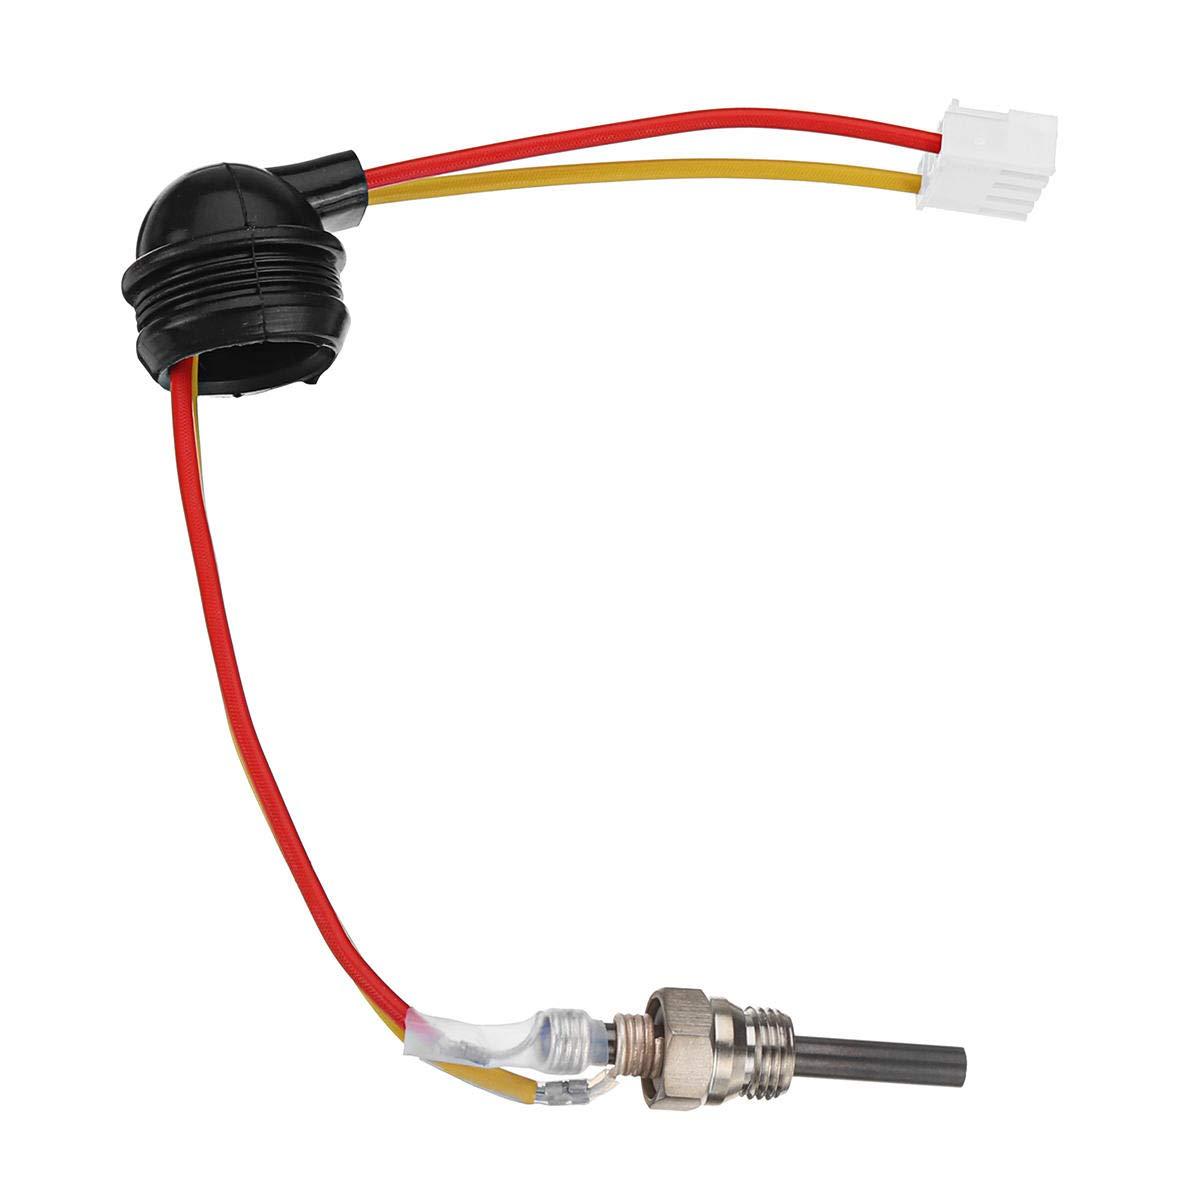 12V 88-98W Ceramic Pin Glow Plug Air Diesel Parking Heater For Car Truck unbekannt